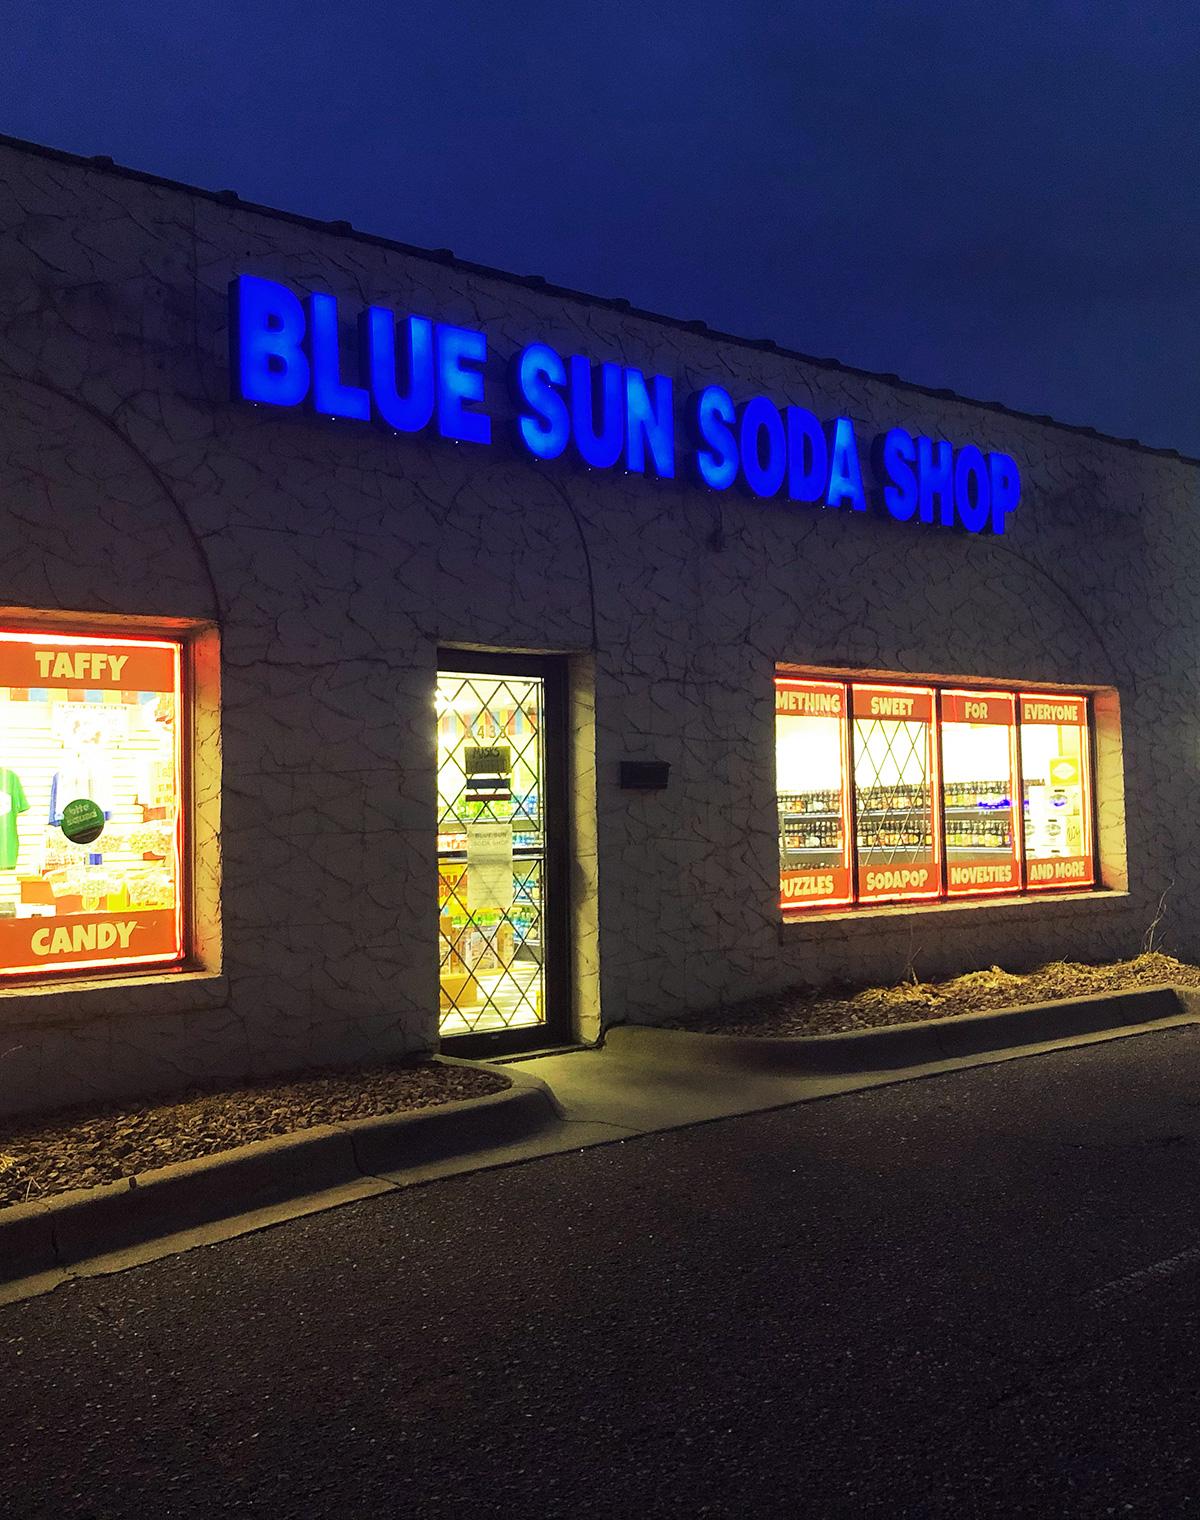 Richfield Soda Shop image